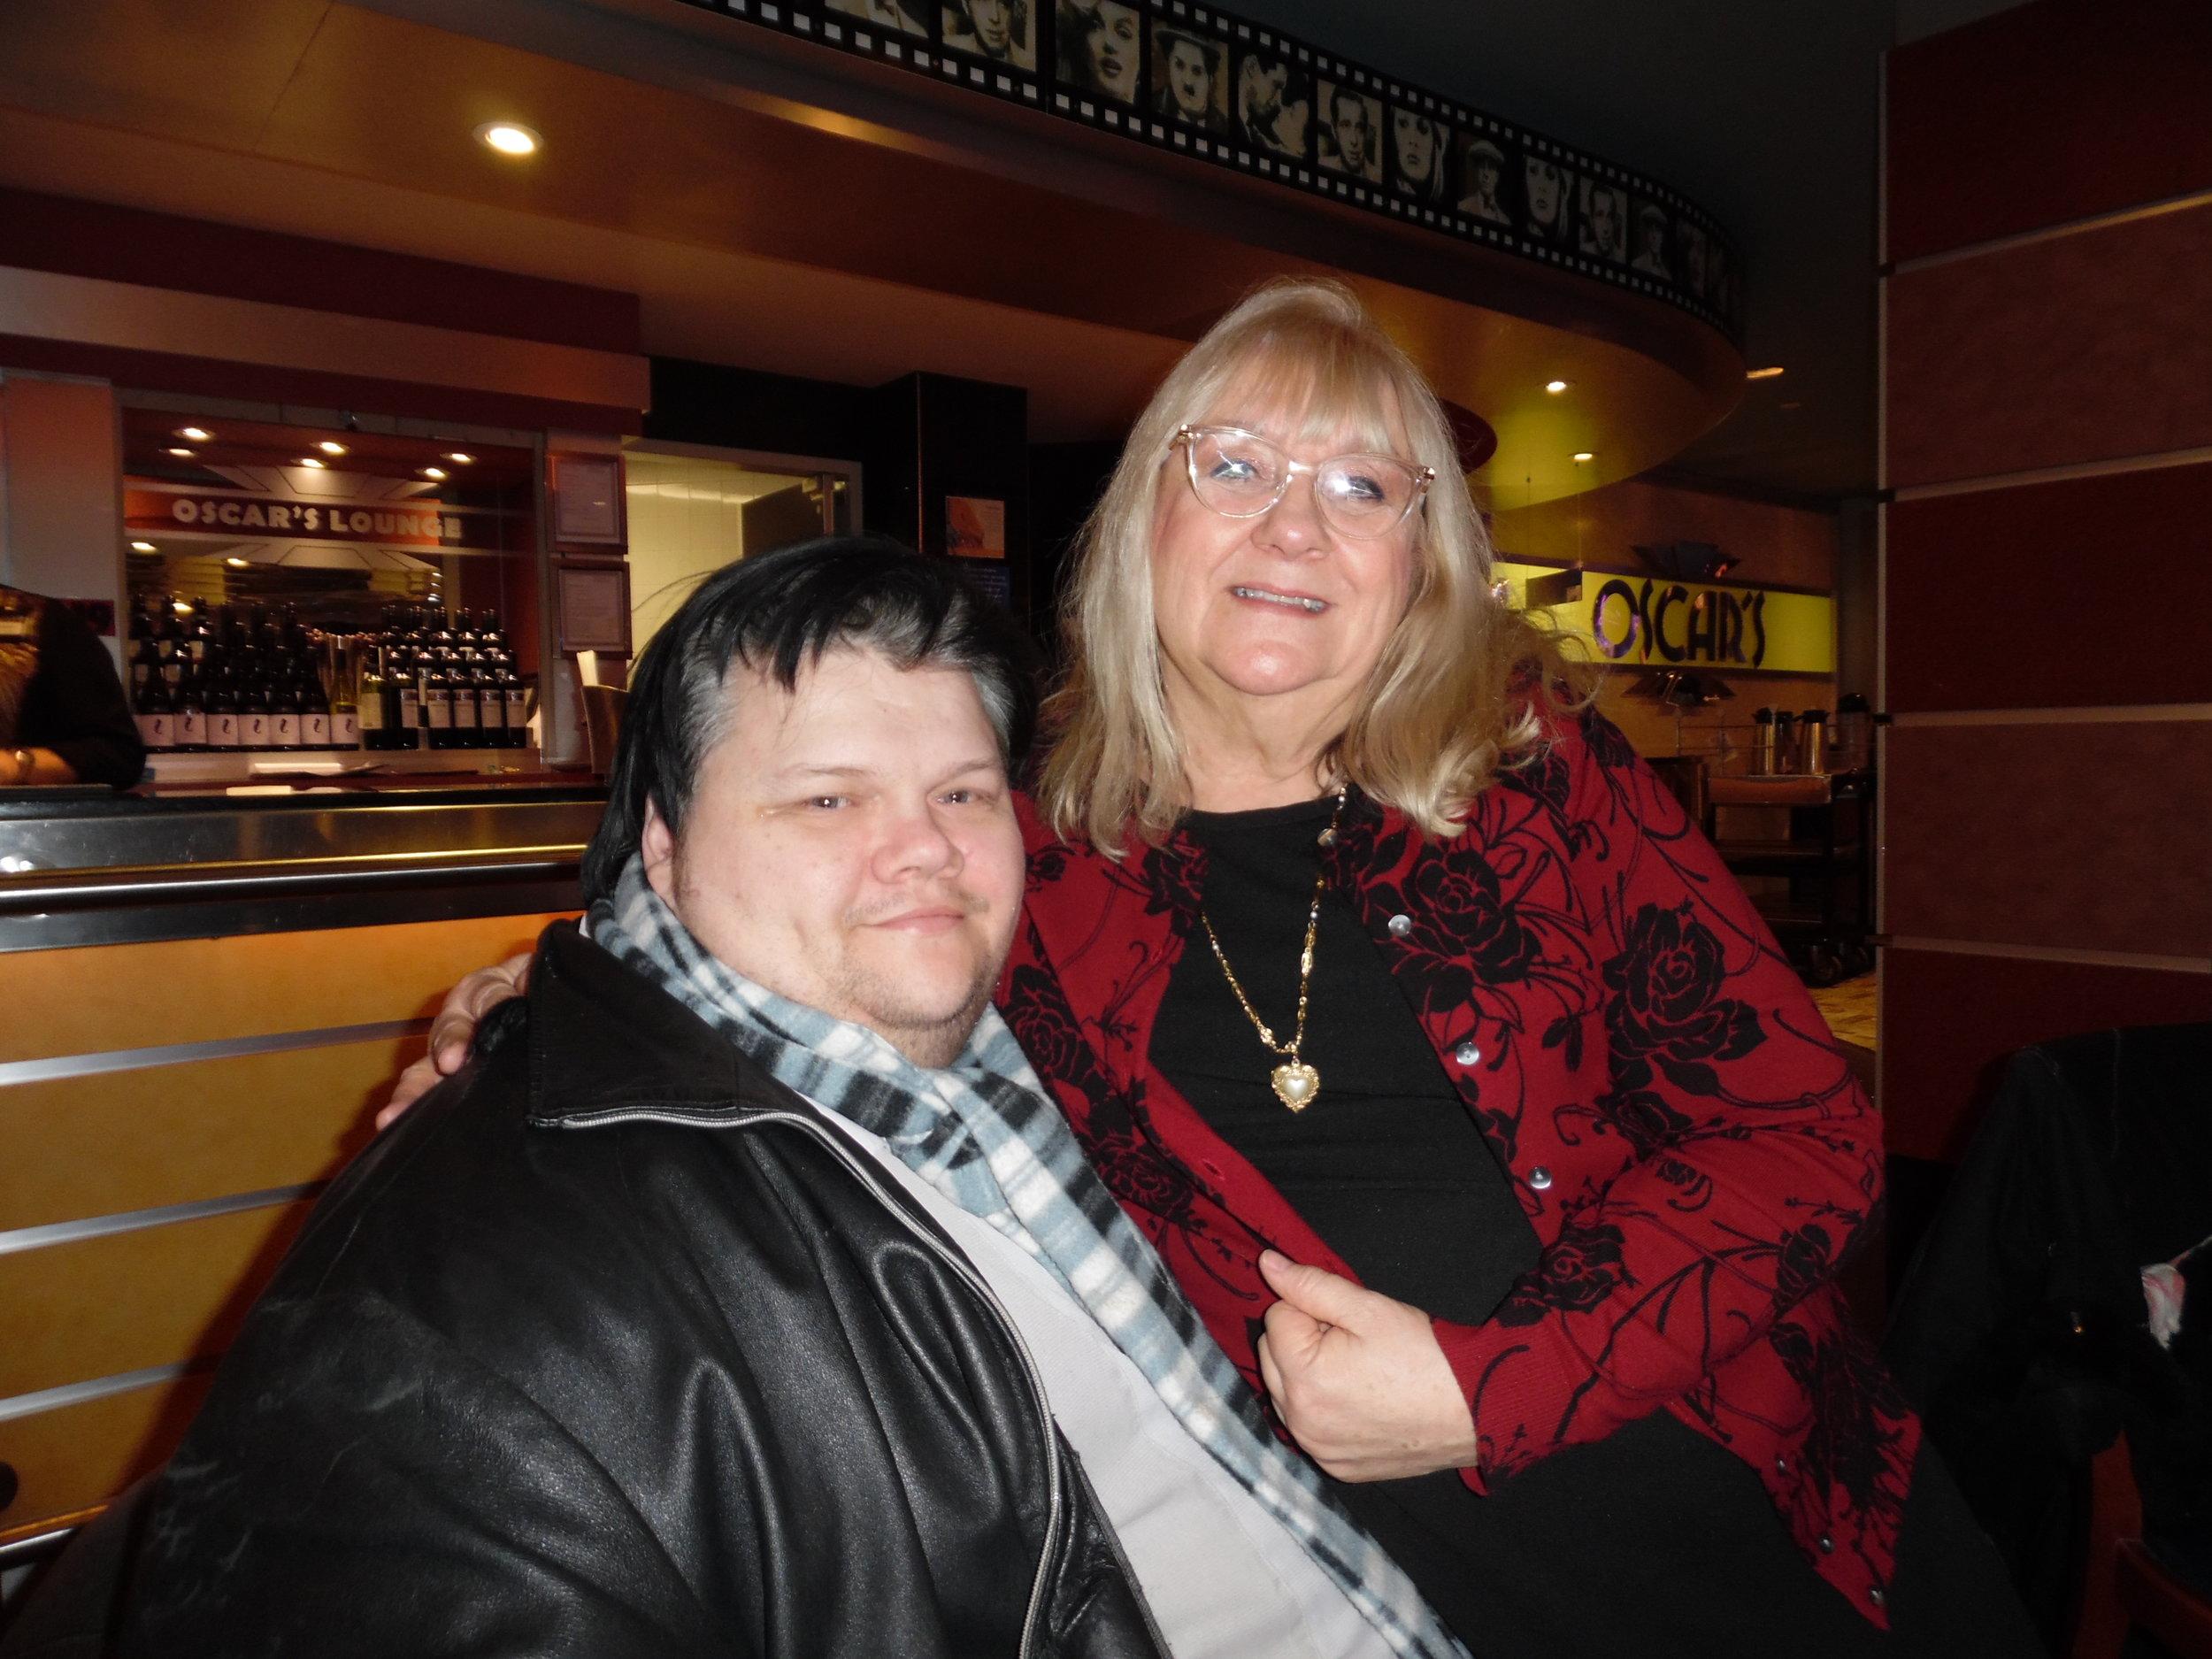 ETA  Chris Cooper  with Carolyn MacArthur at ETA  Mage Cage 's show at Mohawk Raceway.